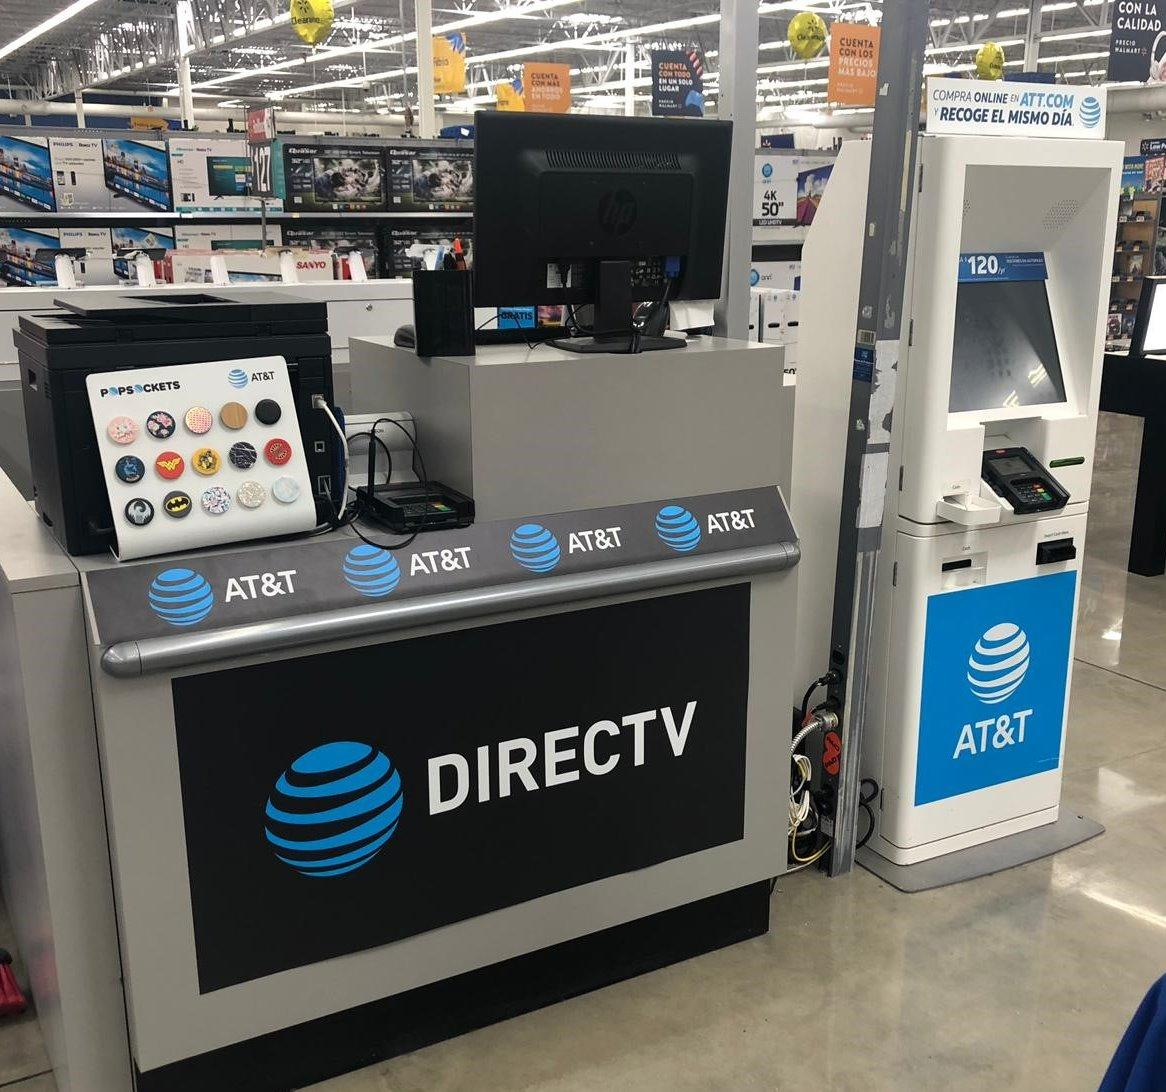 AT&T Store - Walmart Canovanas Kiosk - Canovanas, PR